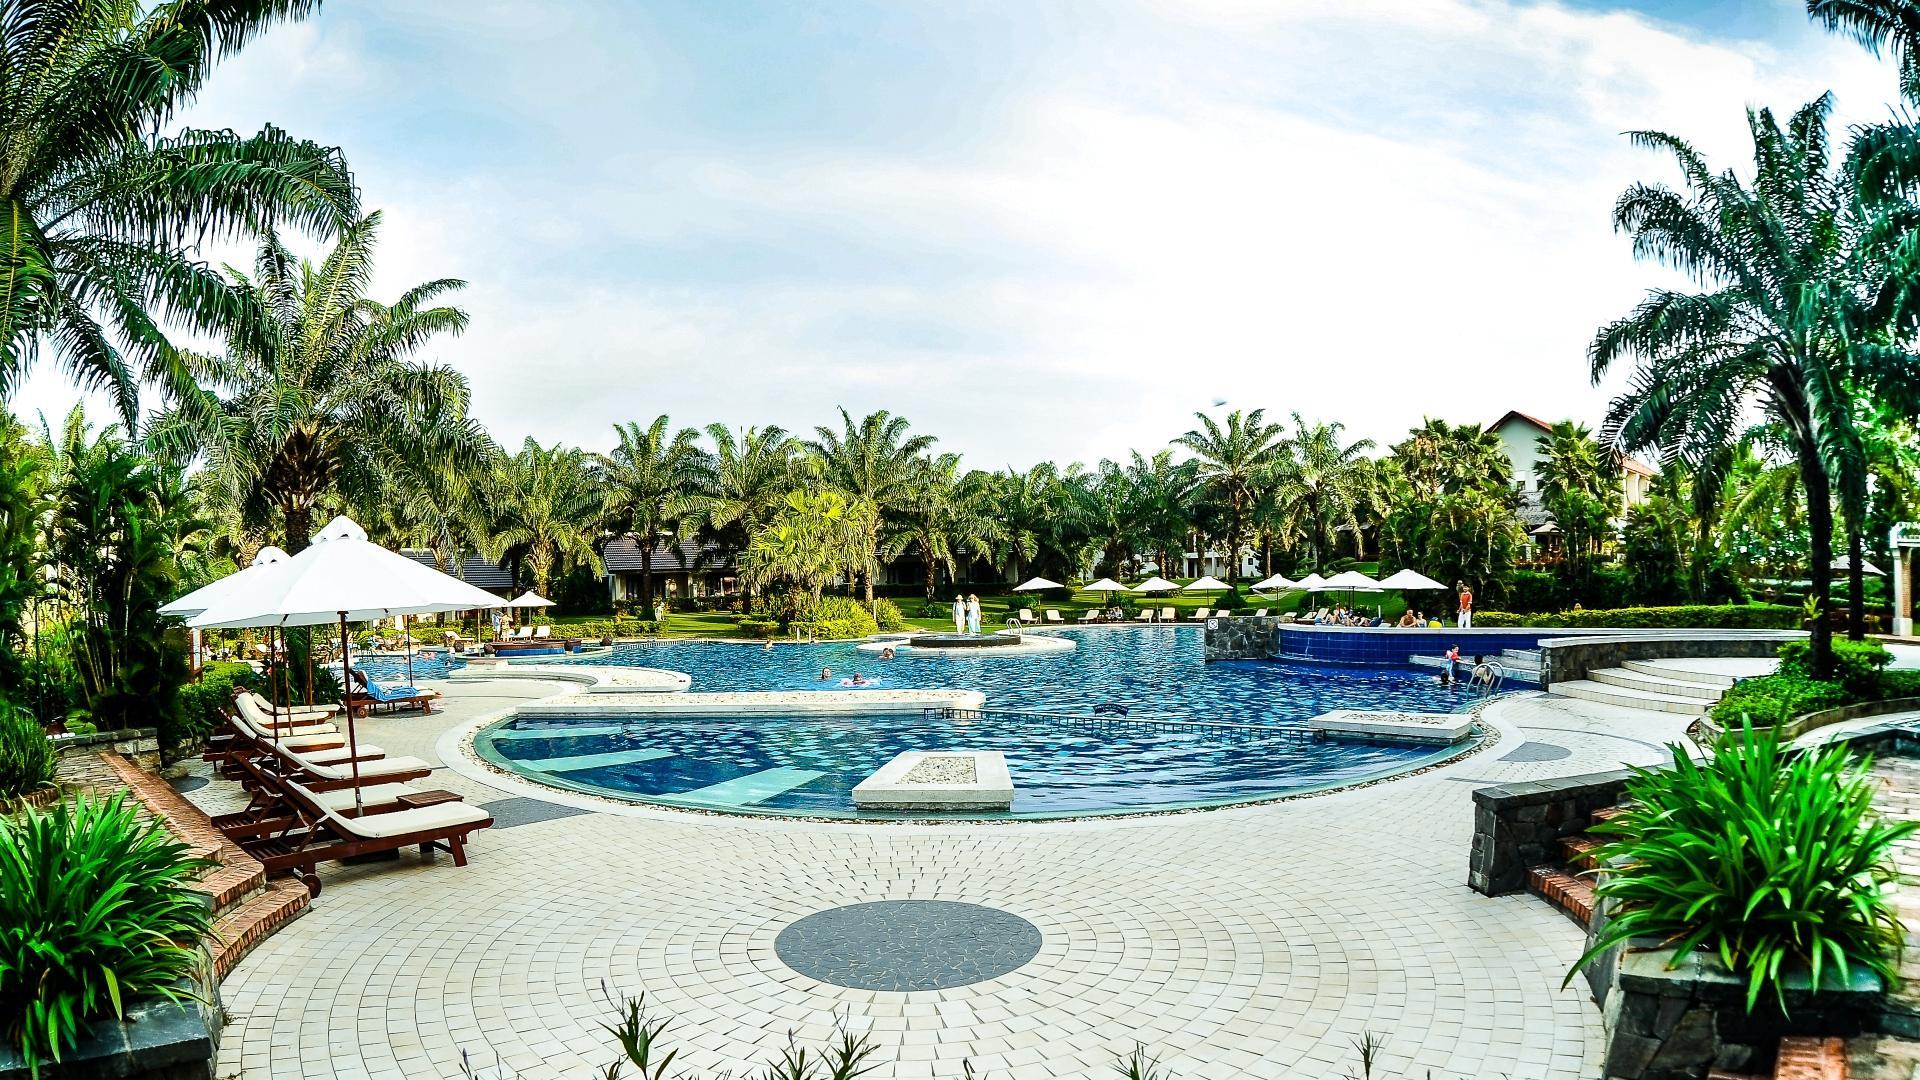 Spa Resort Resorts Luxury Hotel Hotels Reservation Wellness Dlw Worldwide Treatment